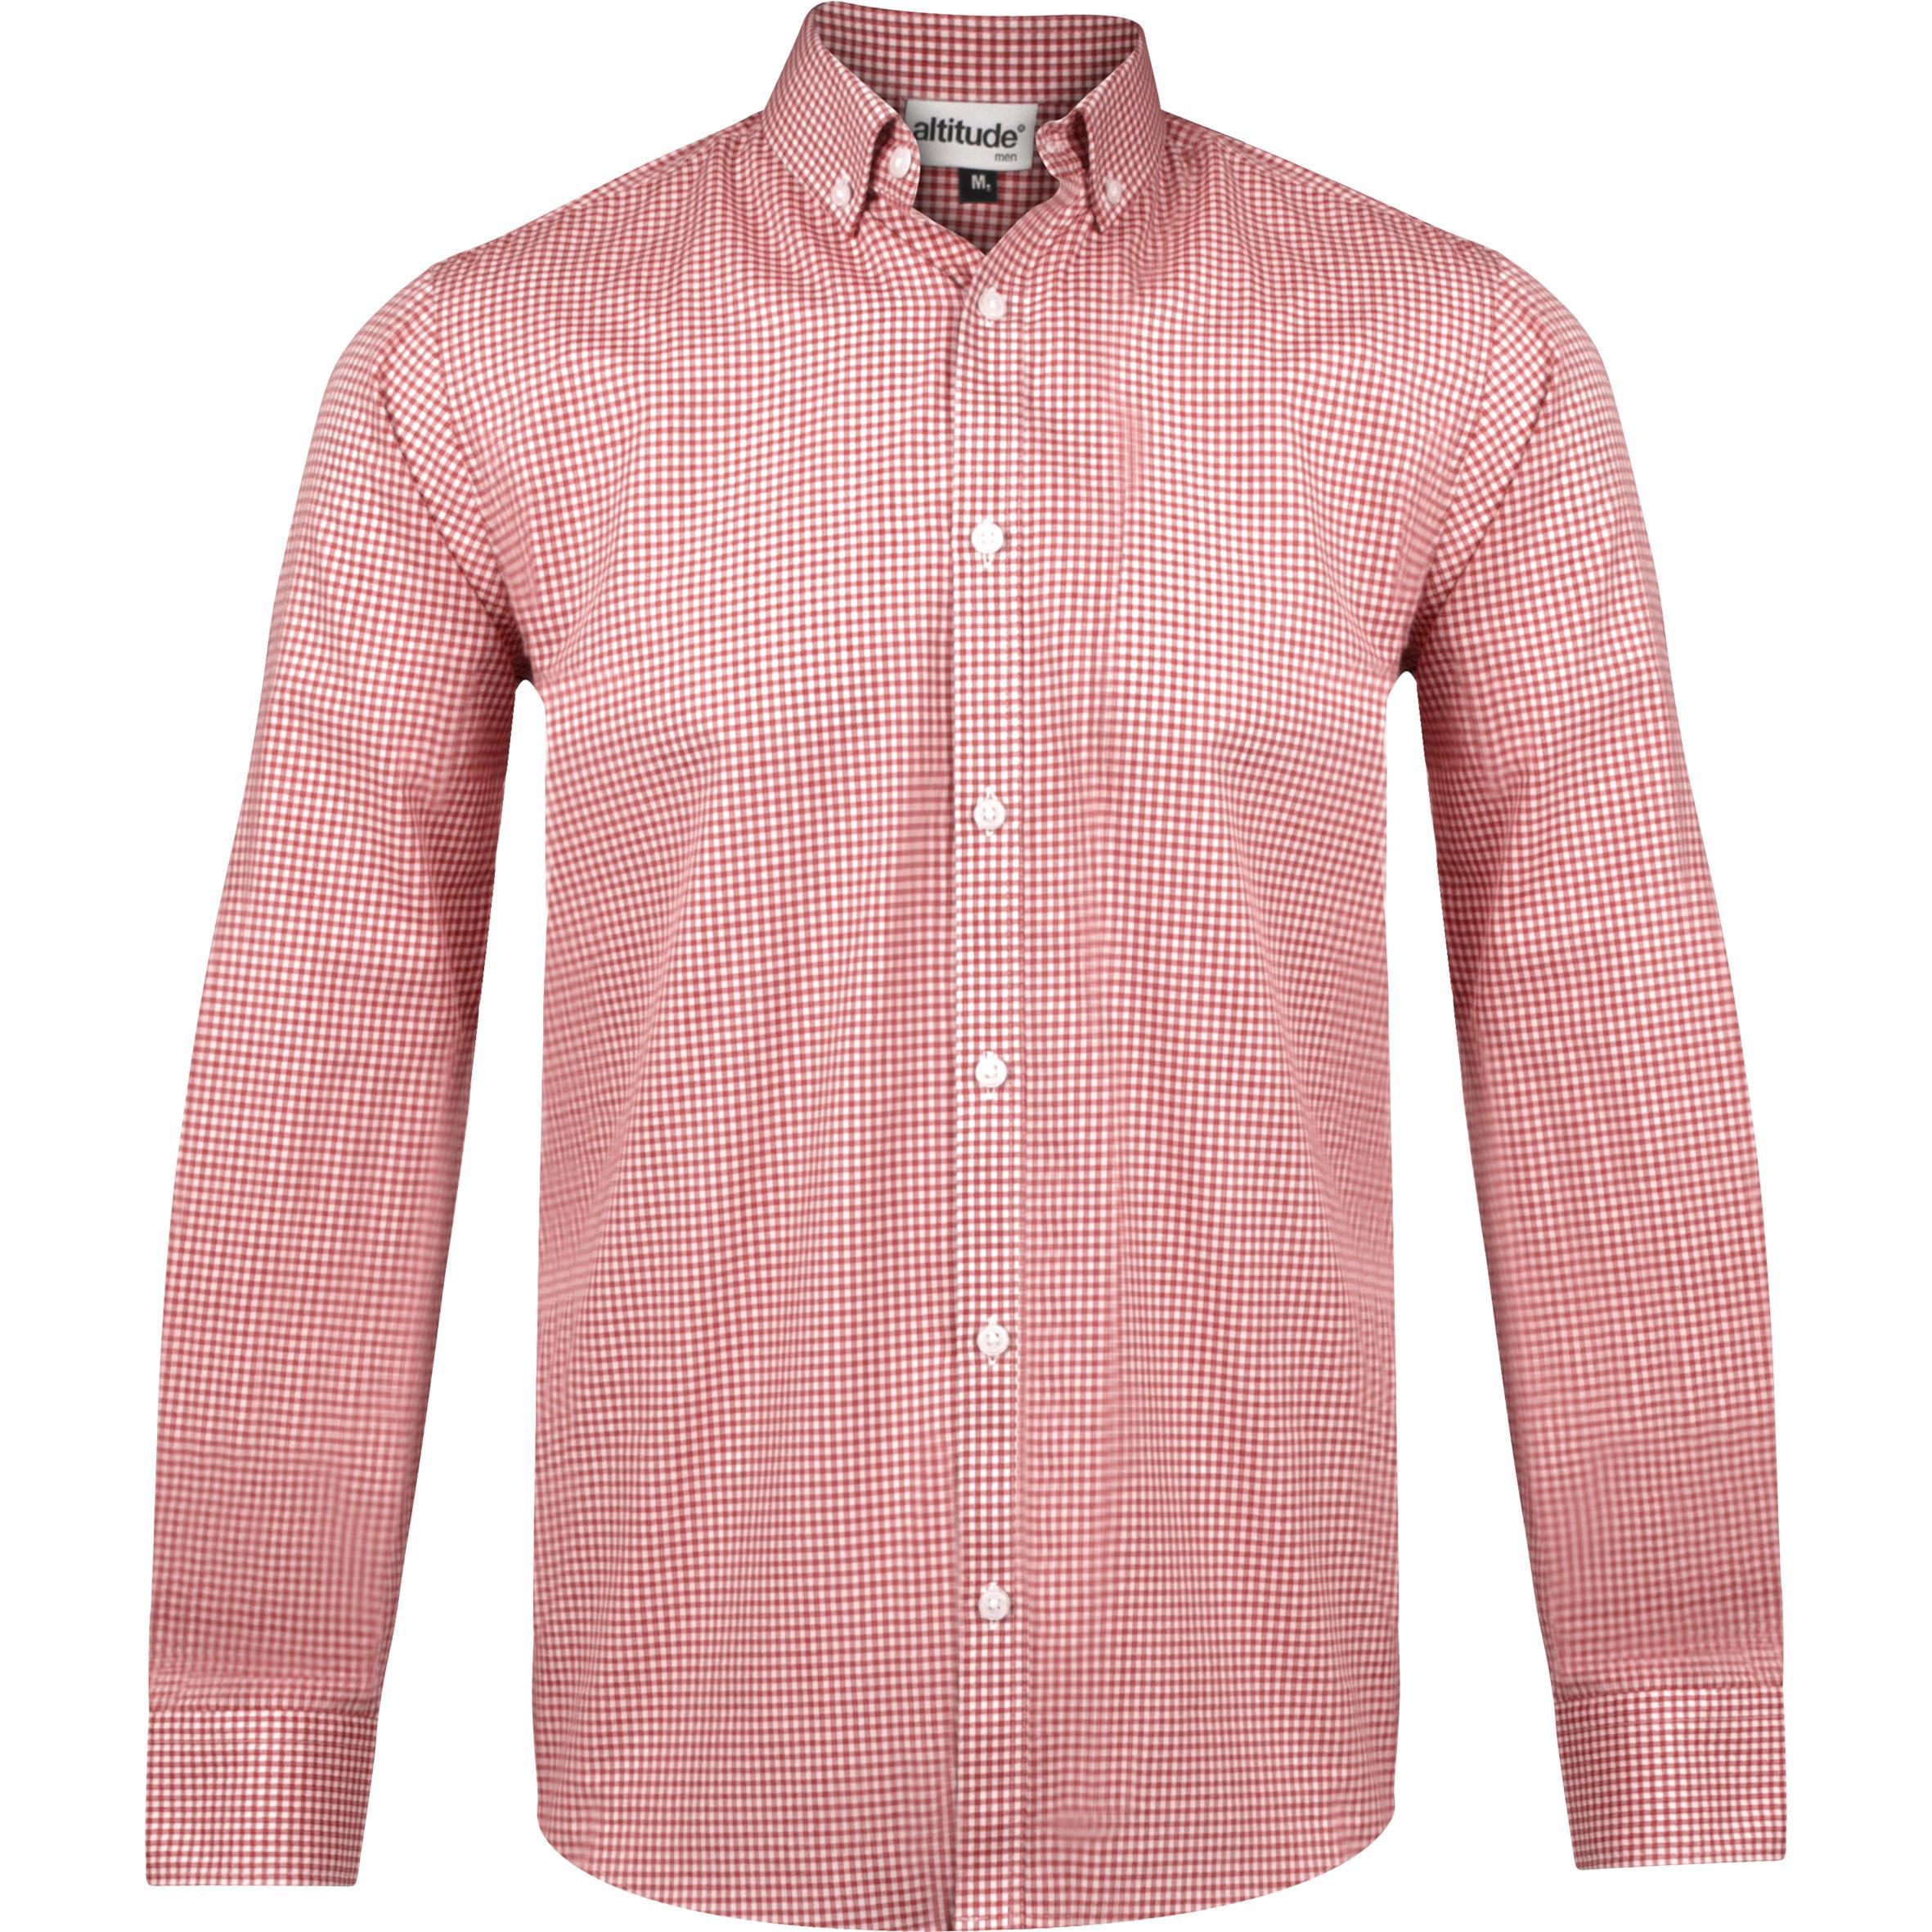 Mens Long Sleeve Edinburgh Shirt - Red Only